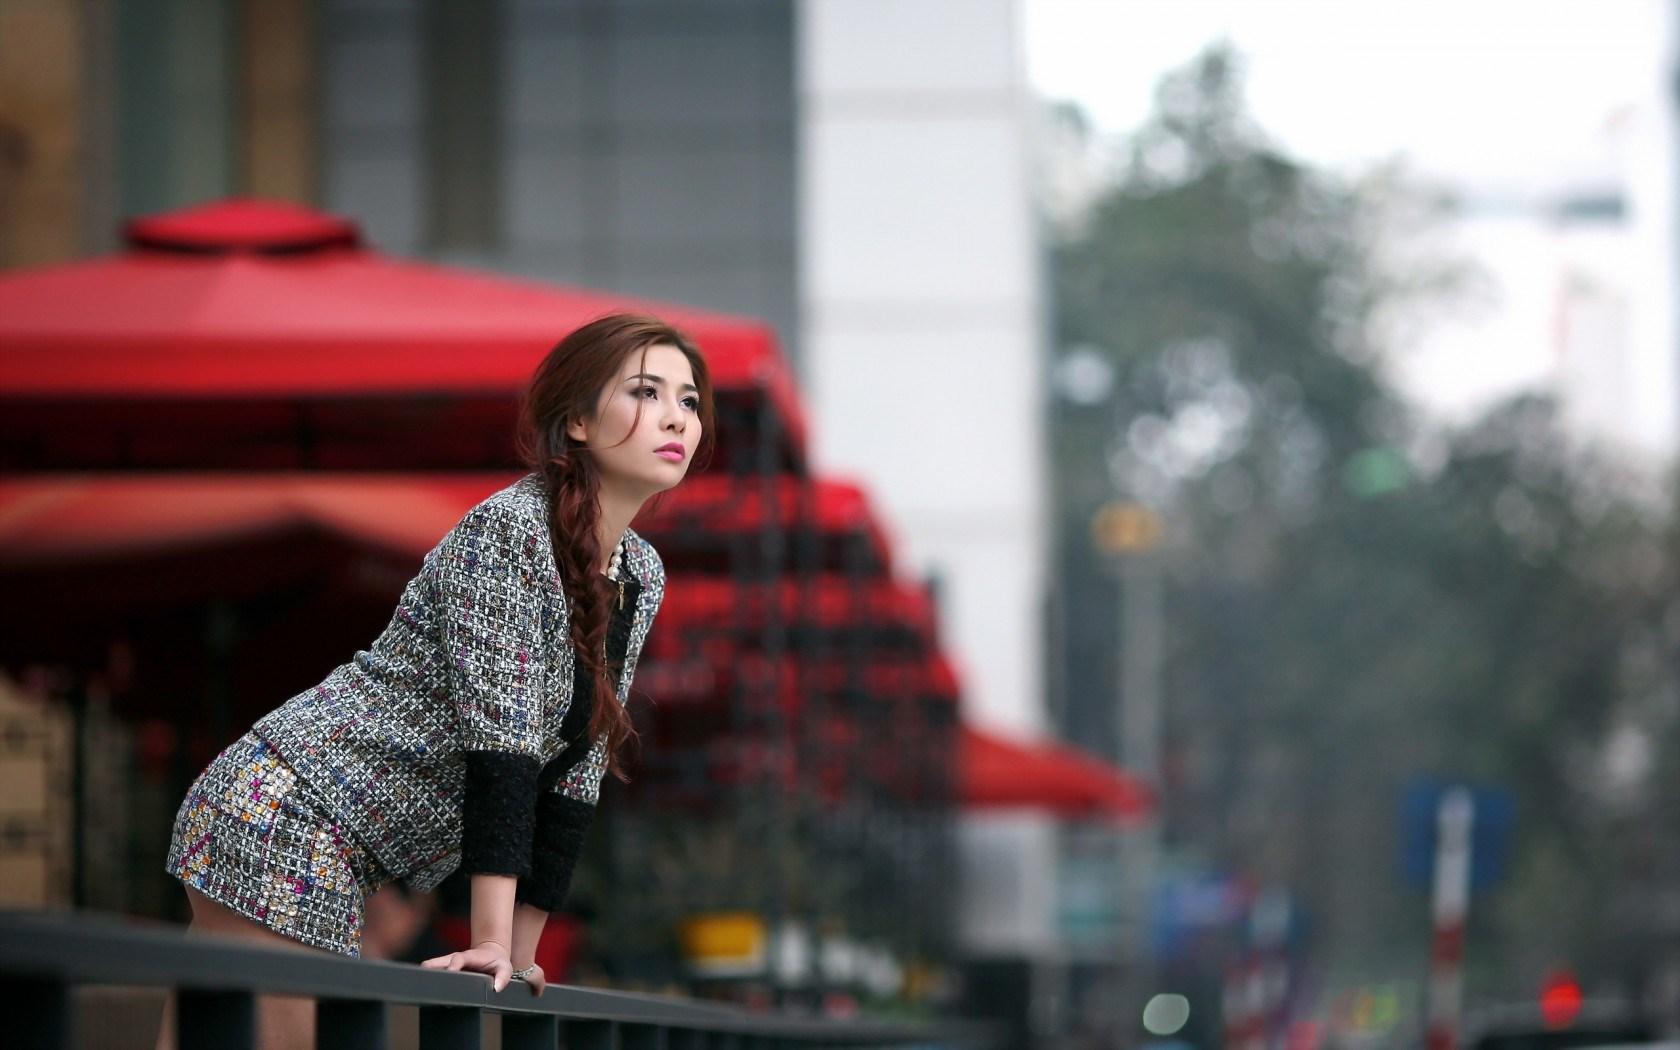 Fashion Model Asian Girl City